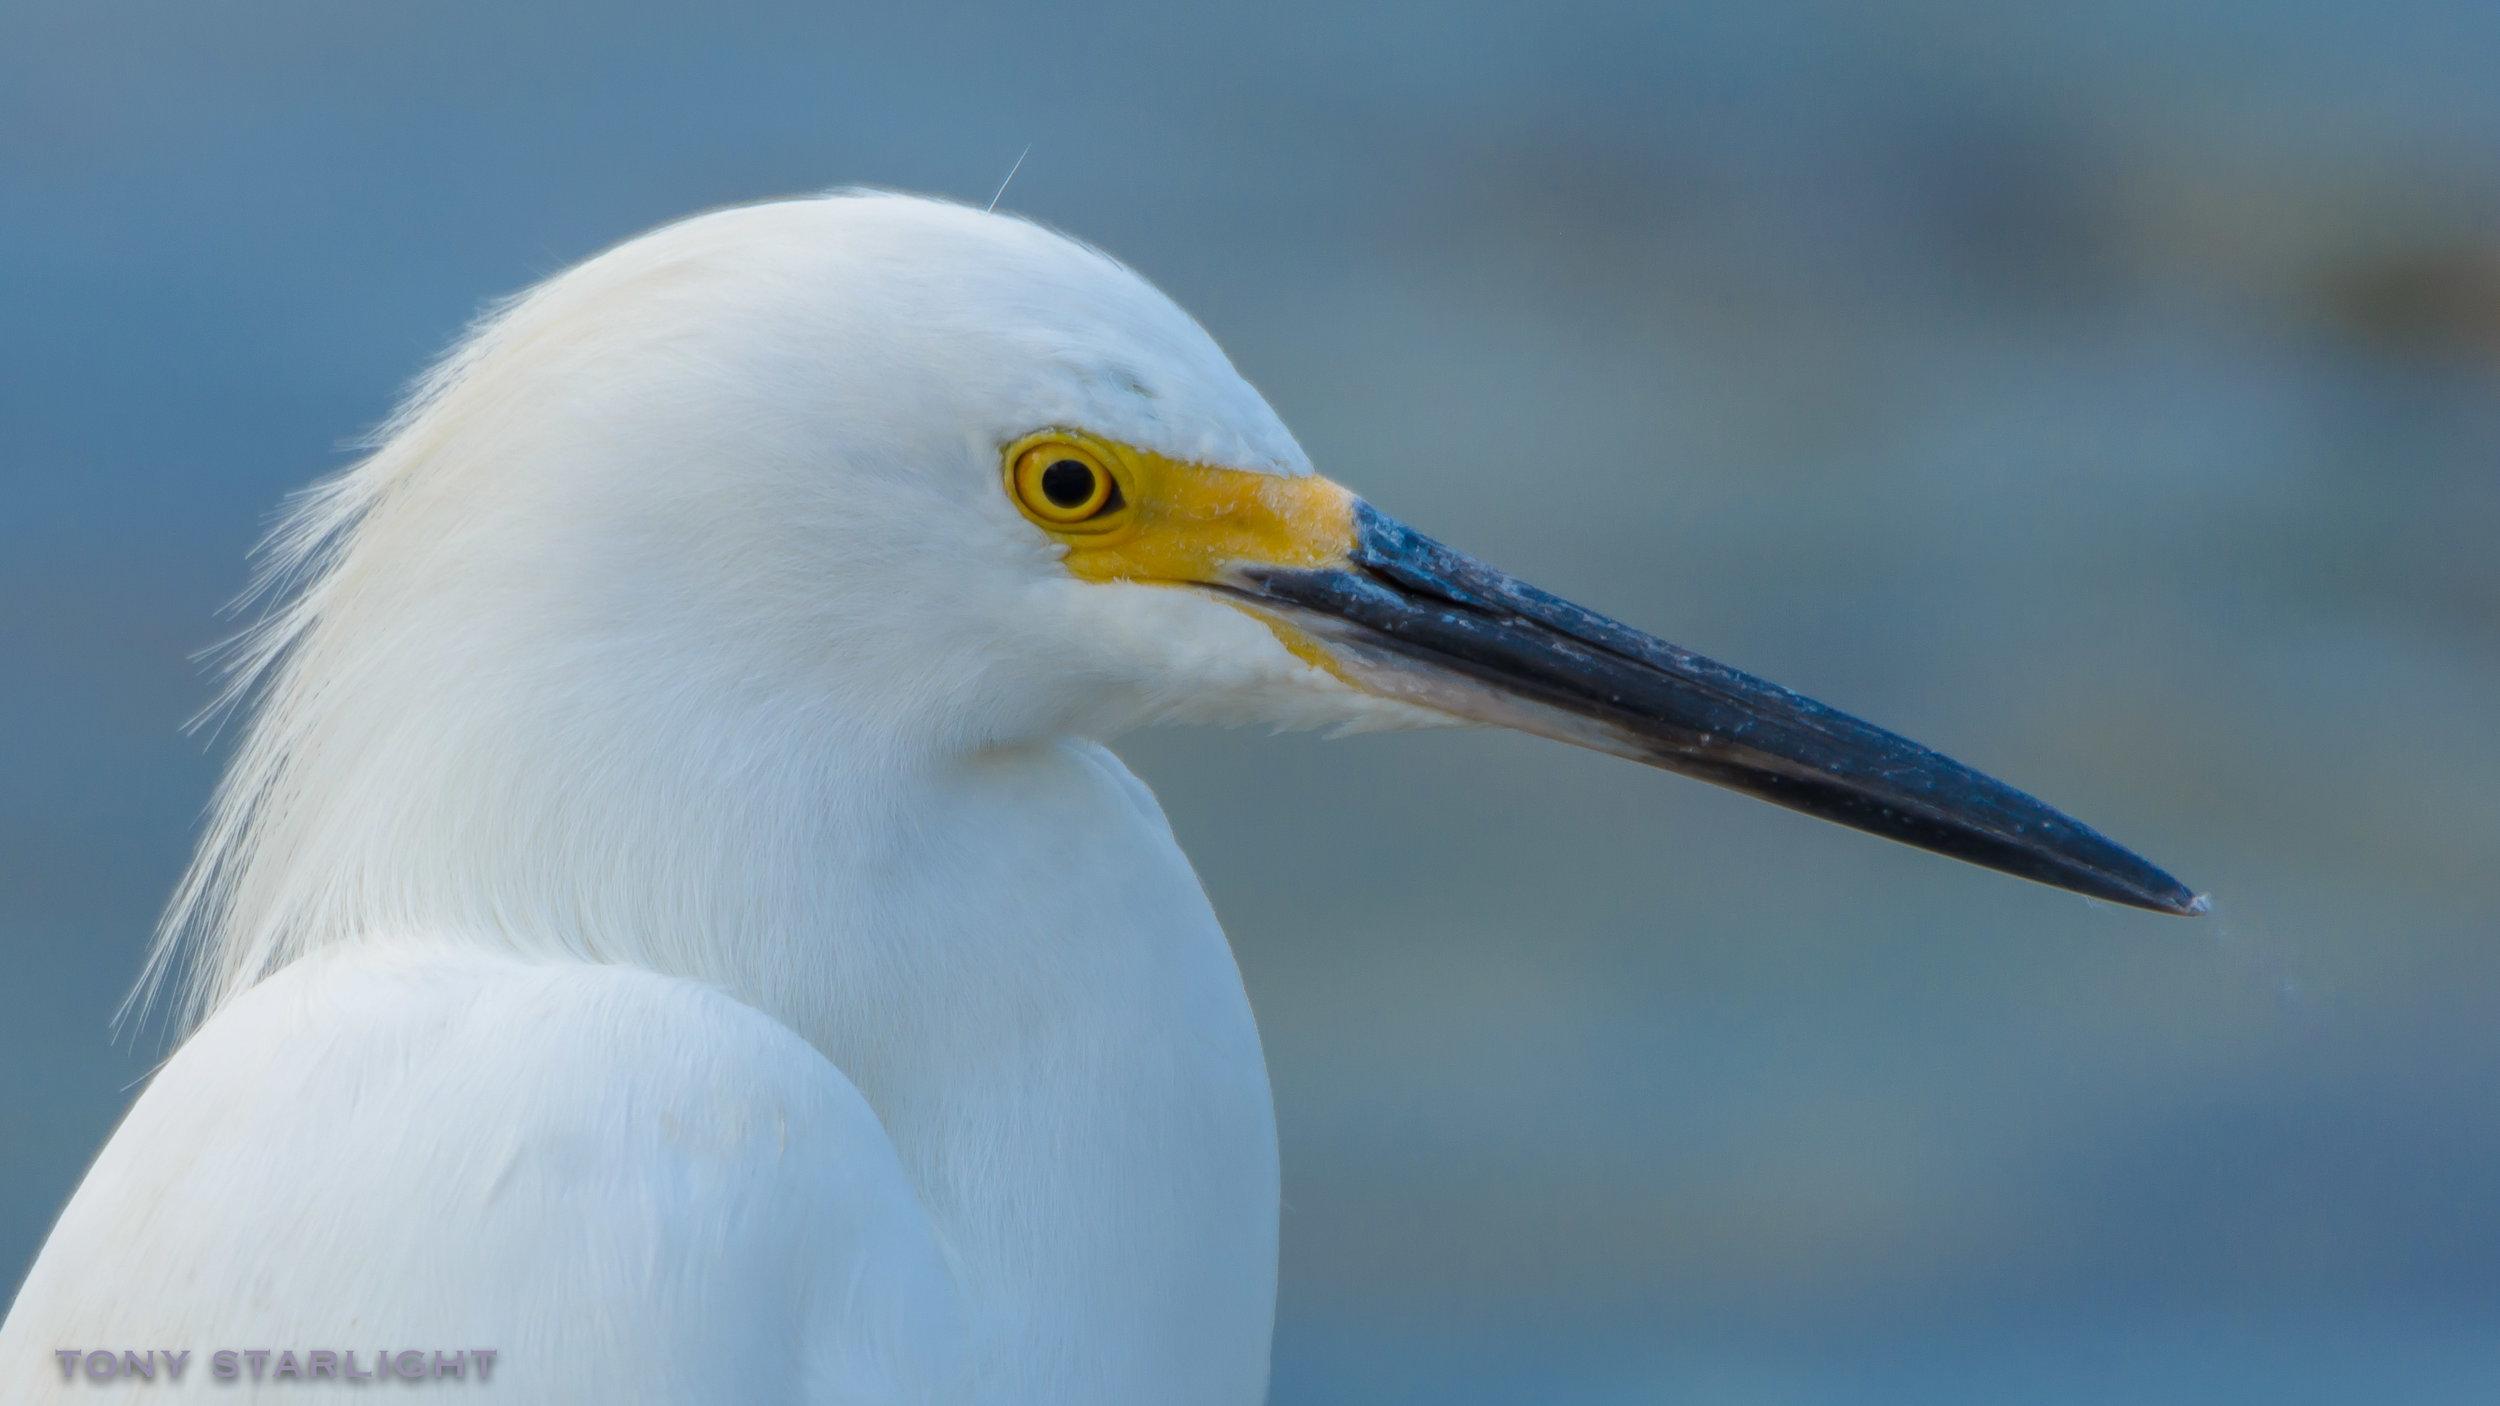 152) Snowy Egret - January 30, 2017Fort De Soto, Florida